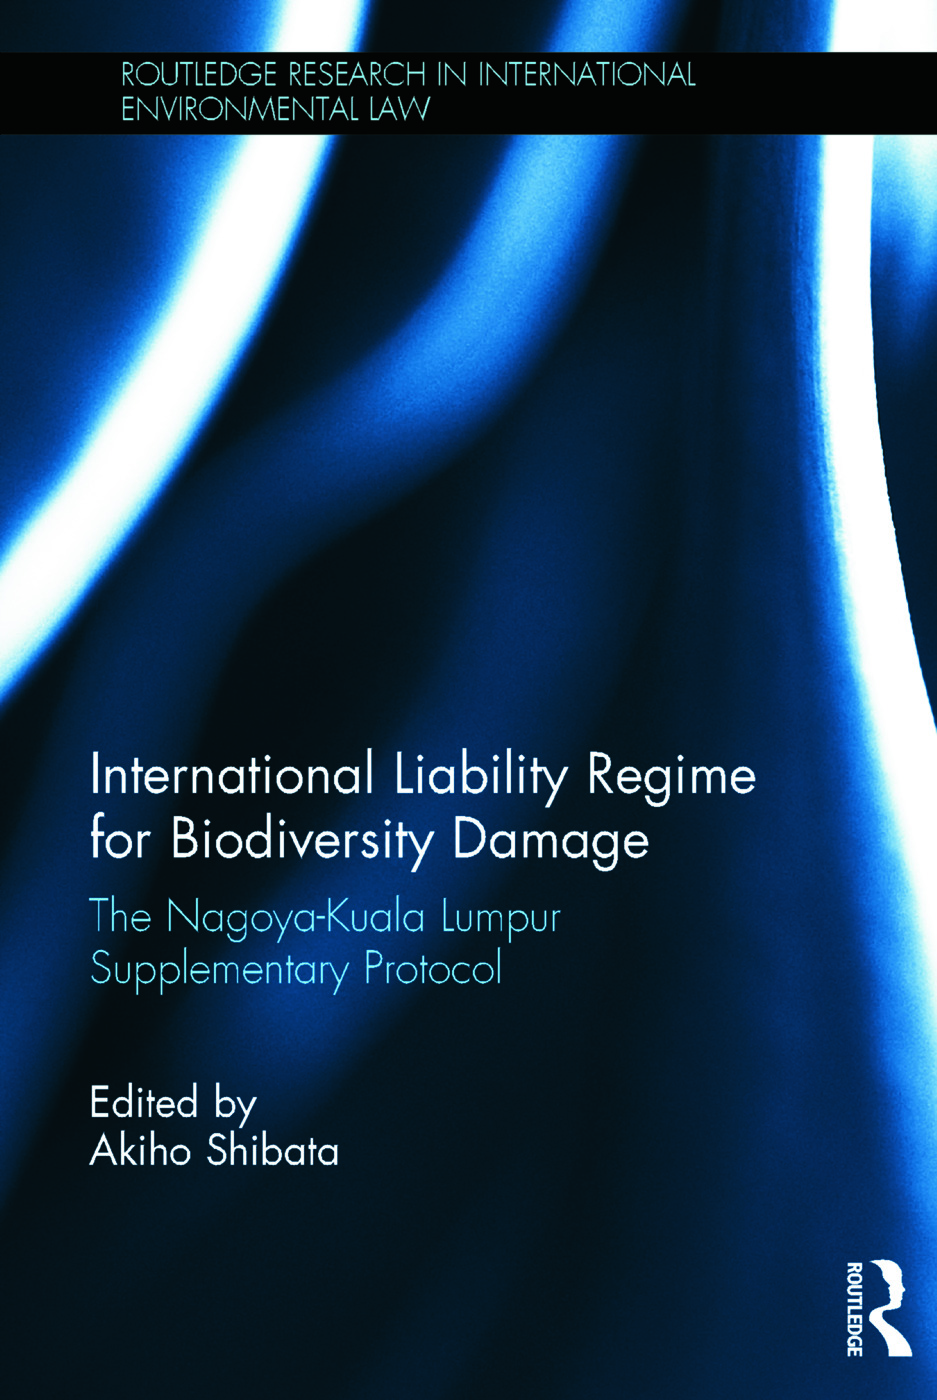 International Liability Regime for Biodiversity Damage: The Nagoya-Kuala Lumpur Supplementary Protocol book cover